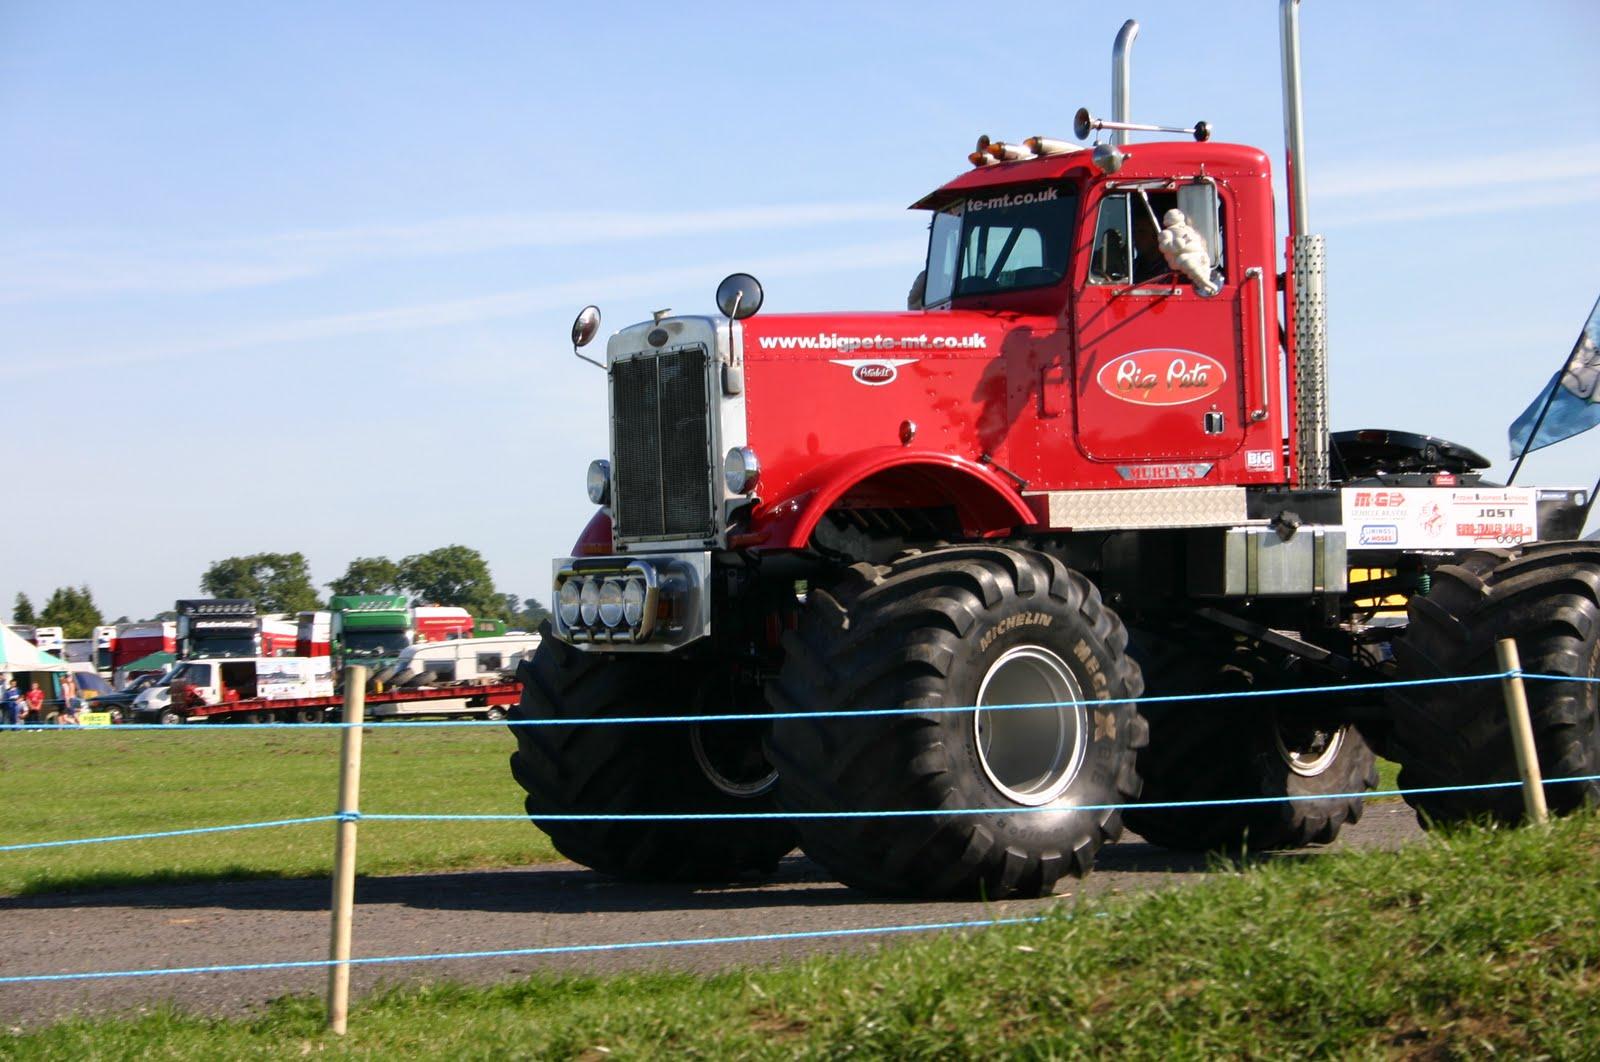 coolest big truck 100knot